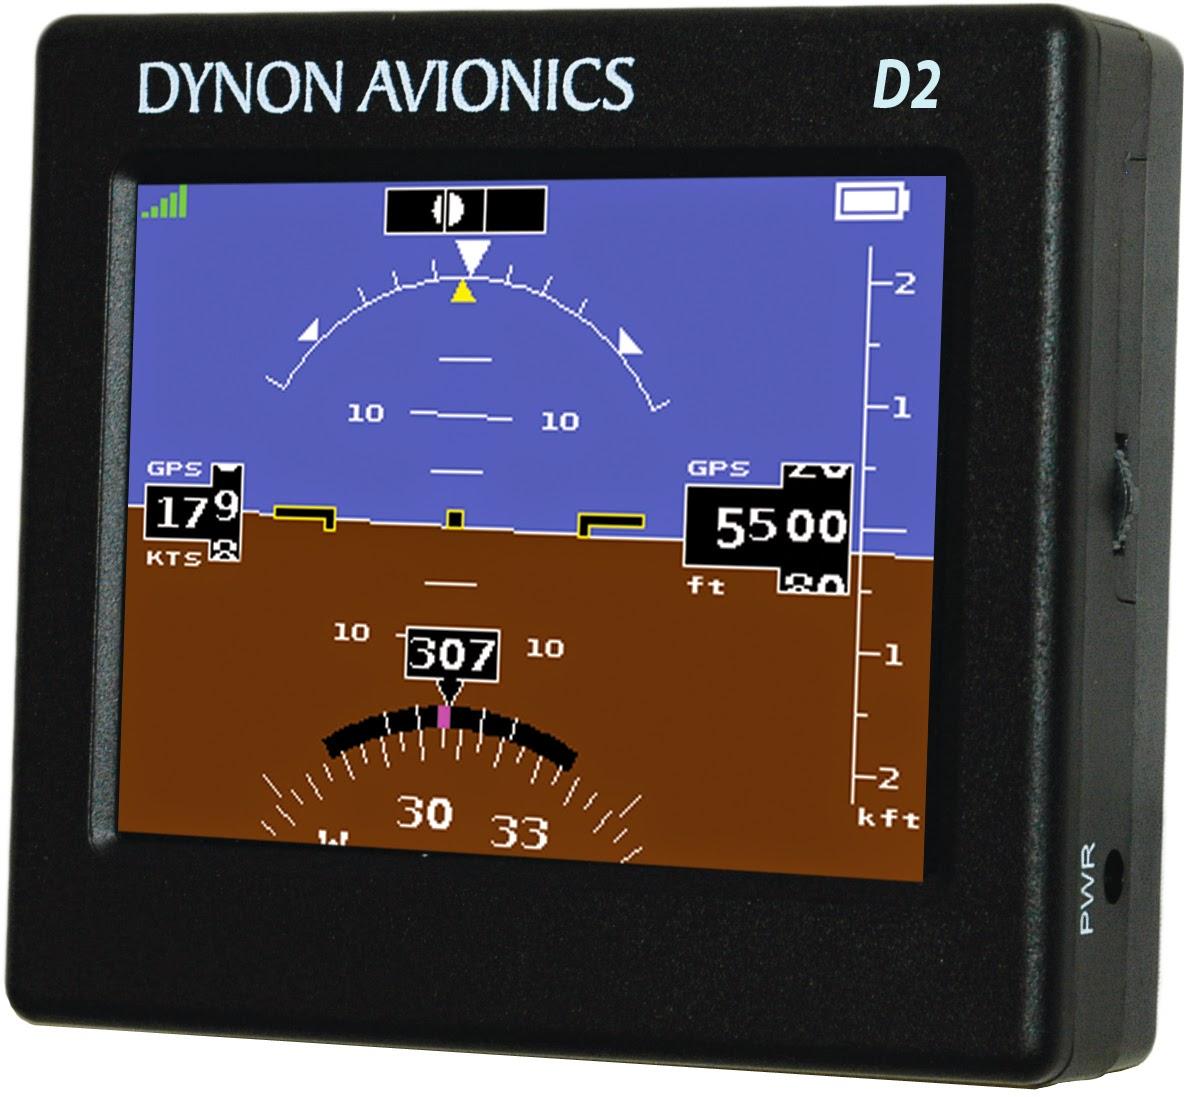 Dynon Preflight Brief: New Lower Price for Dynon D2 Pocket Panel